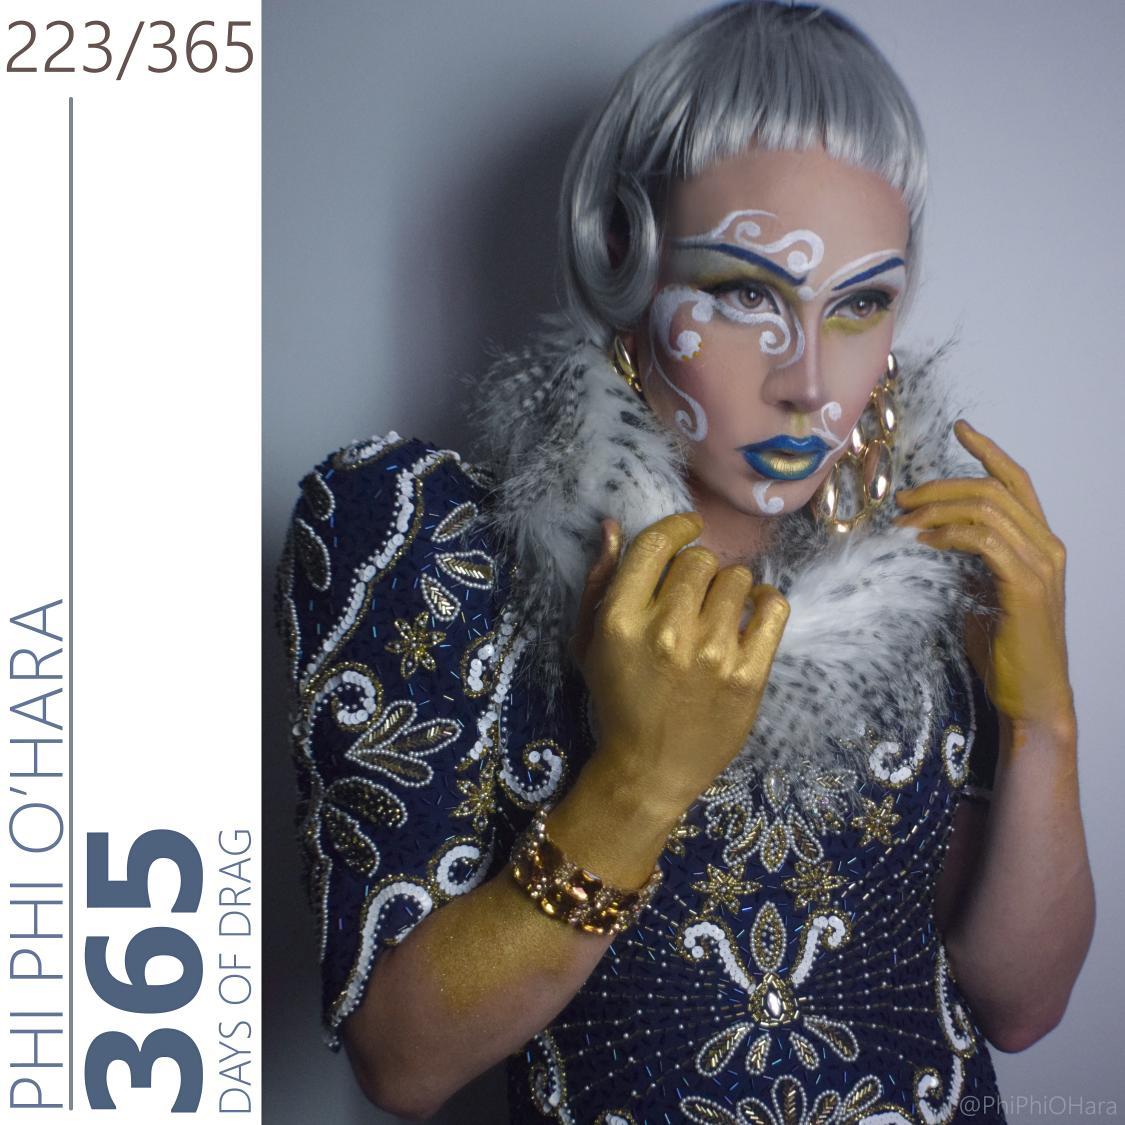 Bildergebnis für phi phi o'hara 365 days of drag 223